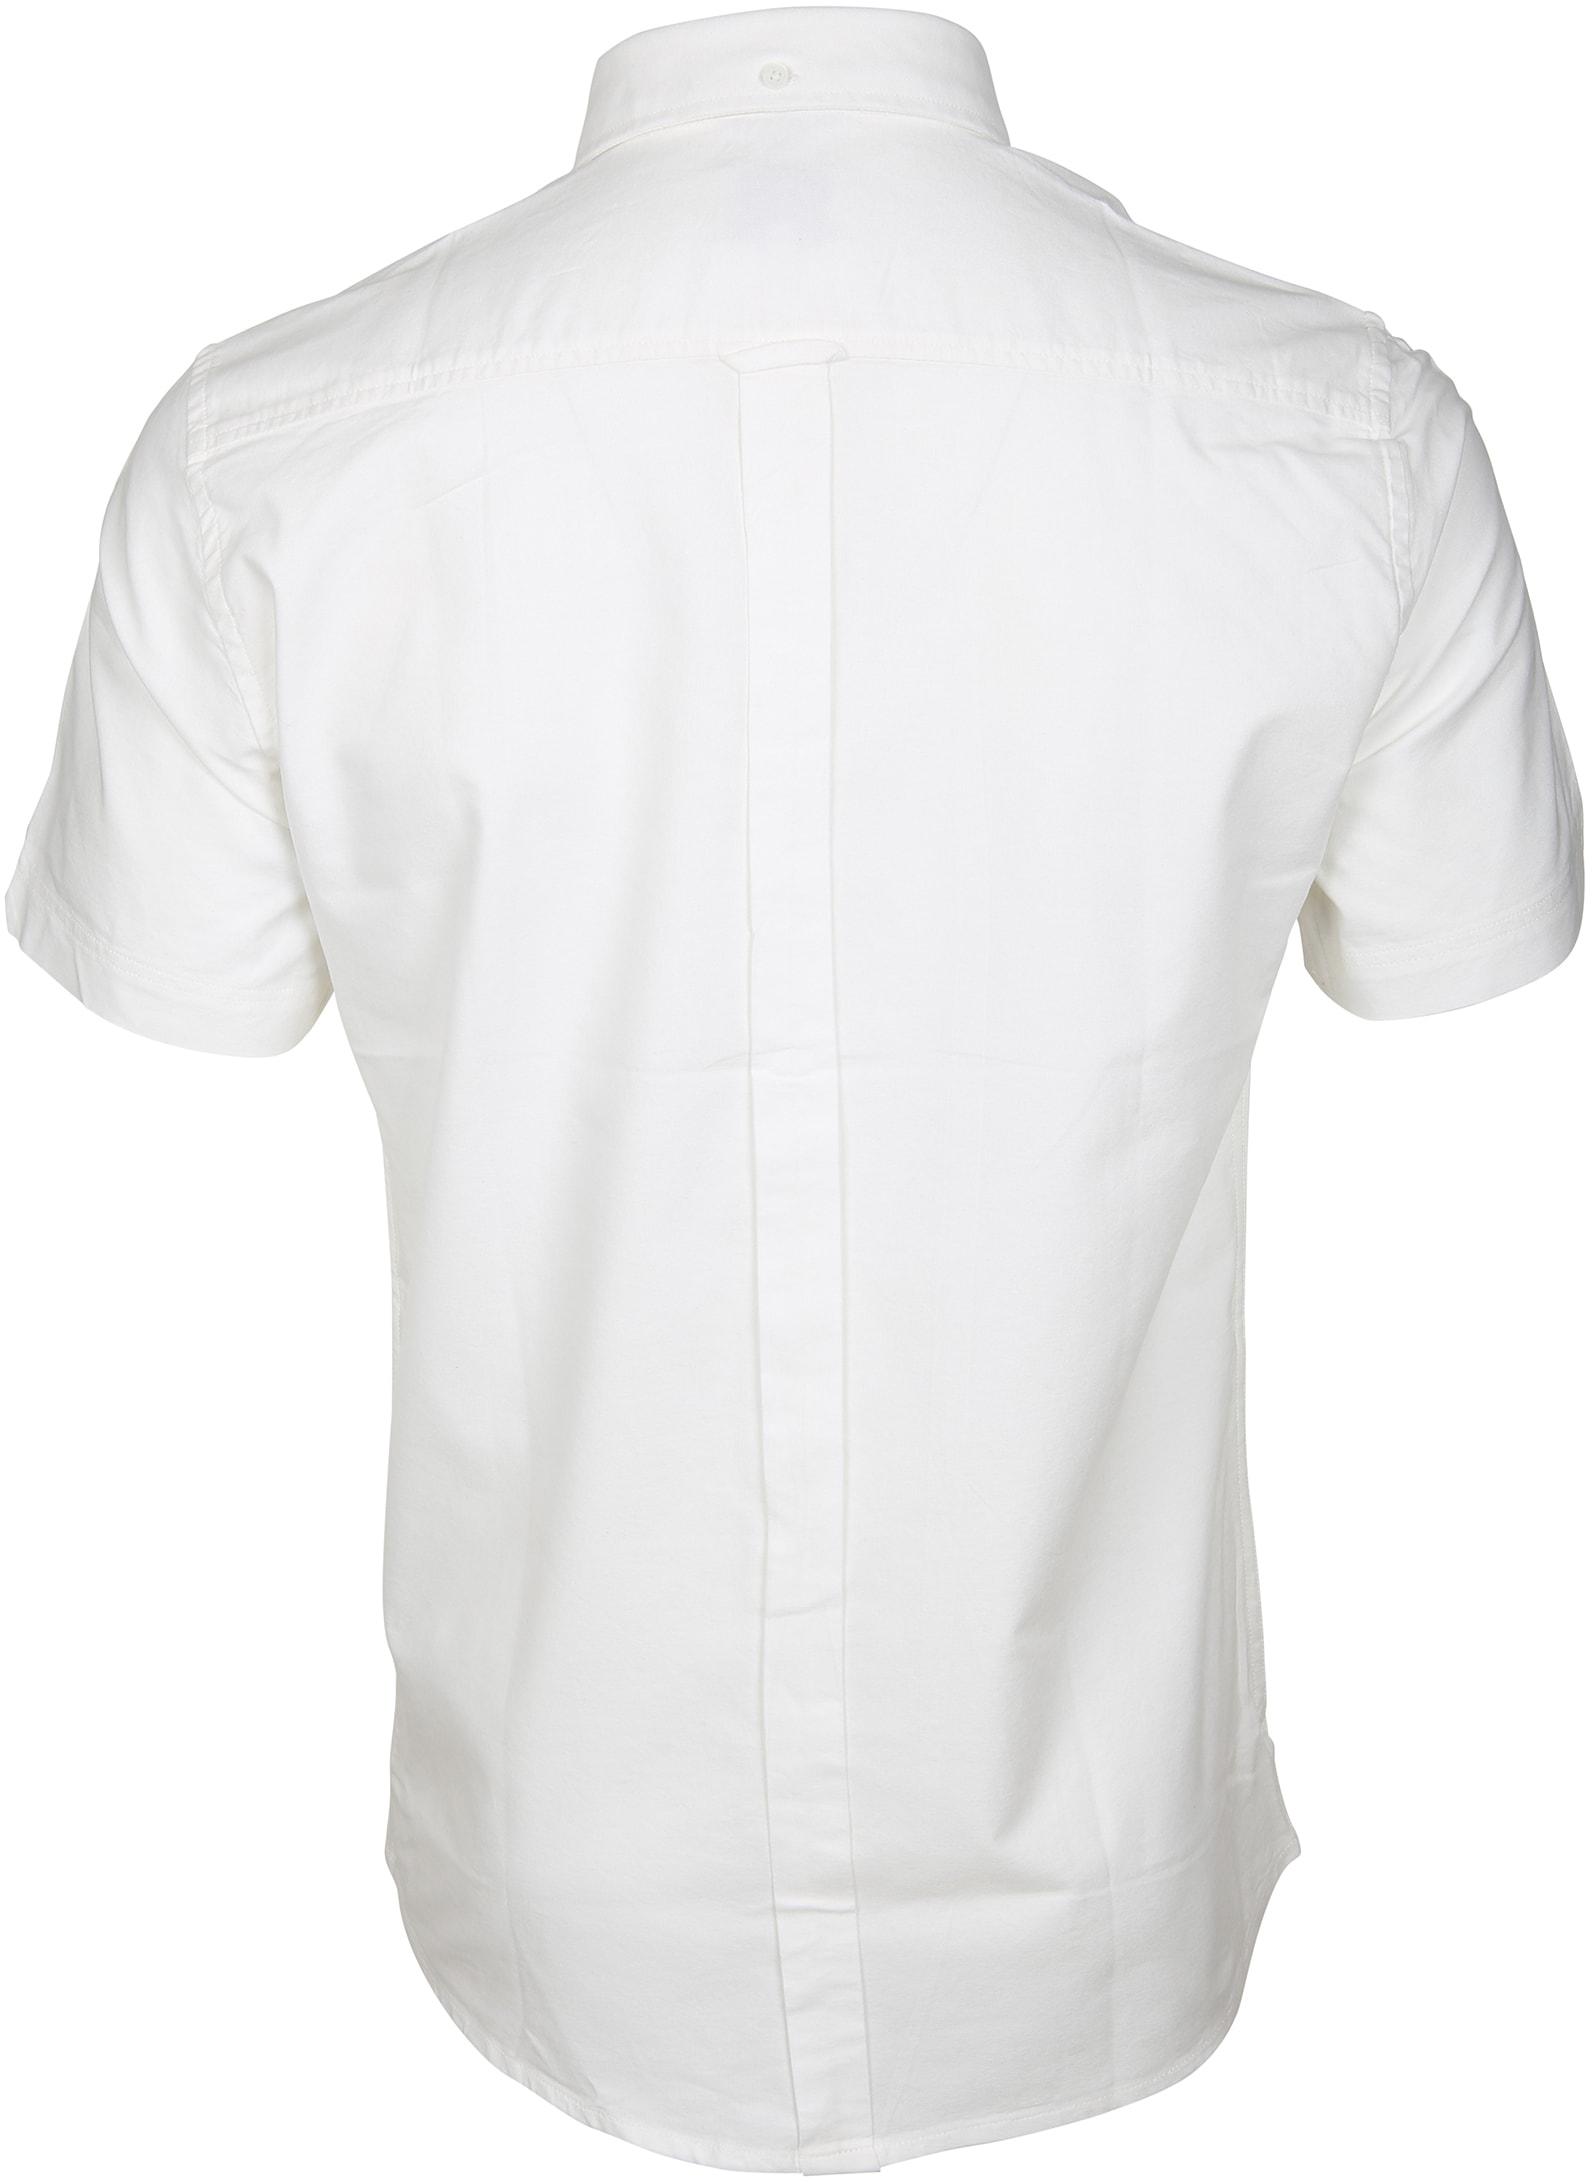 Ben Sherman Overhemd SS Wit foto 2